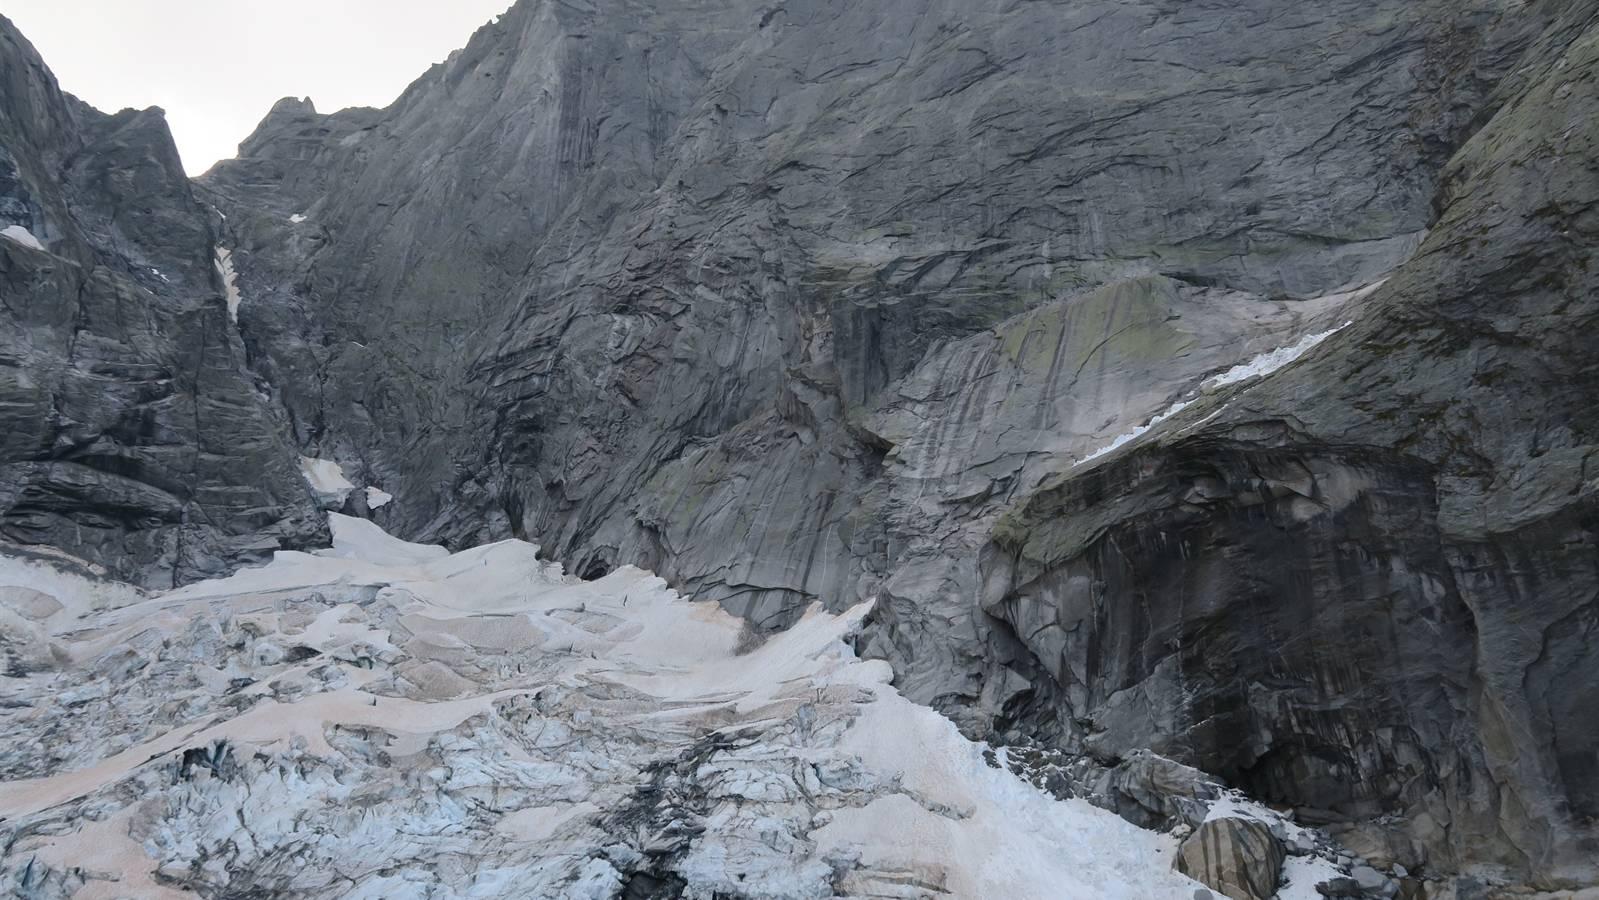 2021-09-15 Bondo Absturz Berggänger__w_1600__h_0